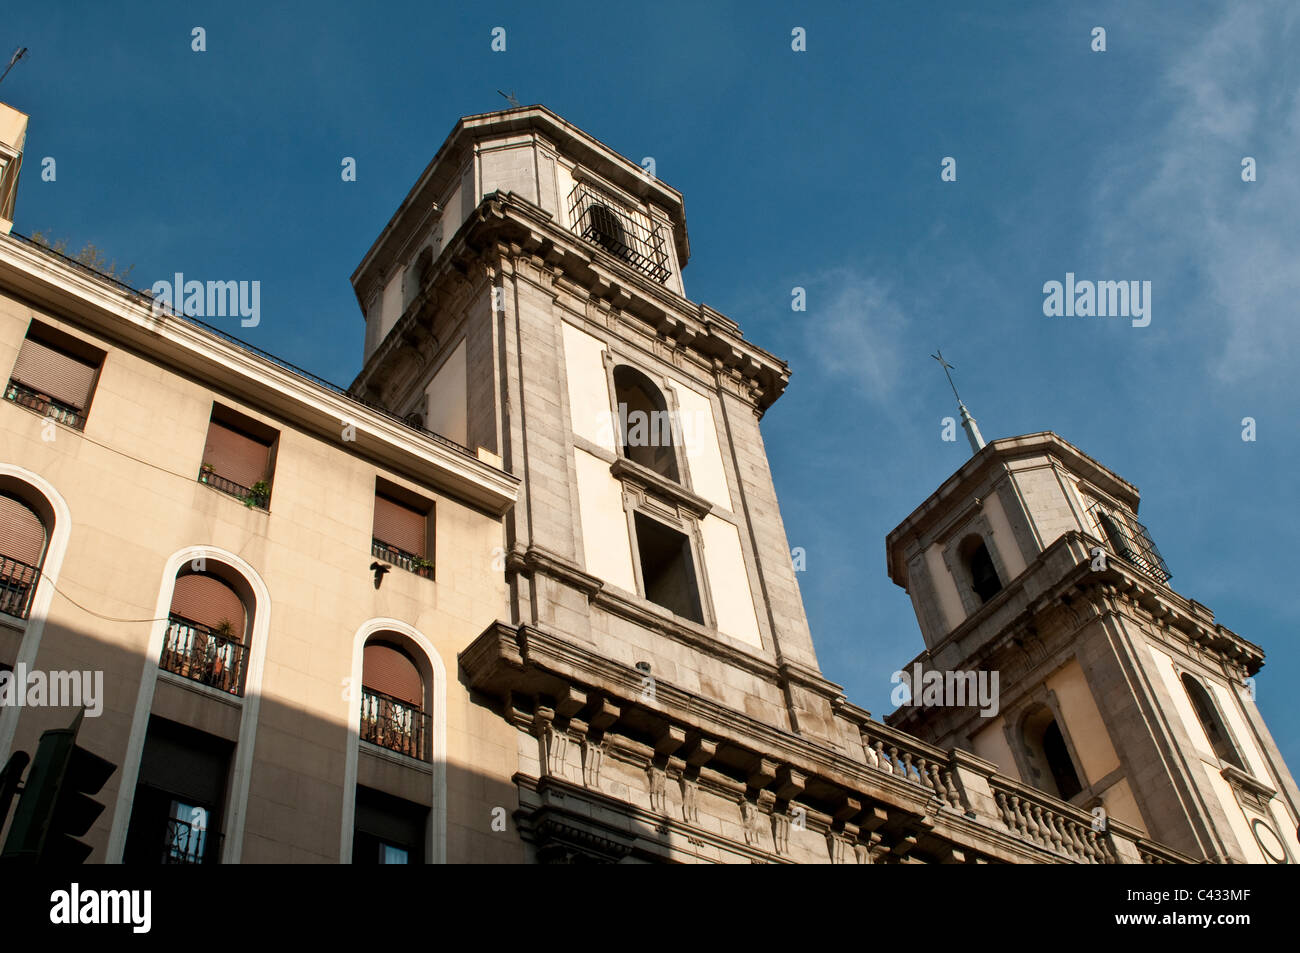 Colegiata de San Isidro, Madrid, Spain Stock Photo